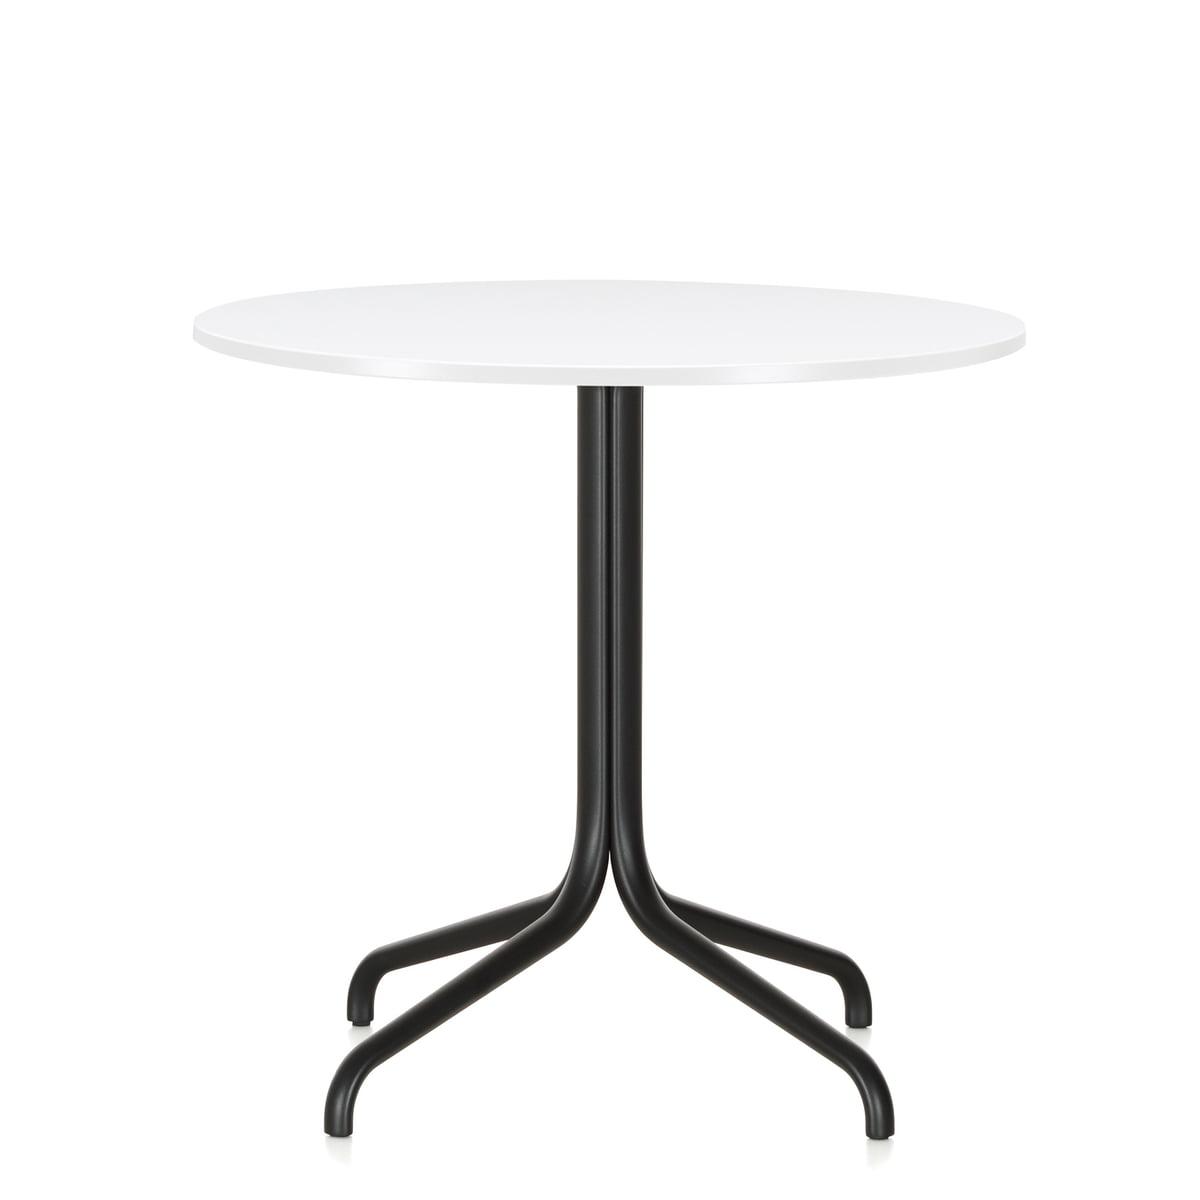 Belleville Bistro Table, Round, Ø 79.6 Cm By Vitra In White